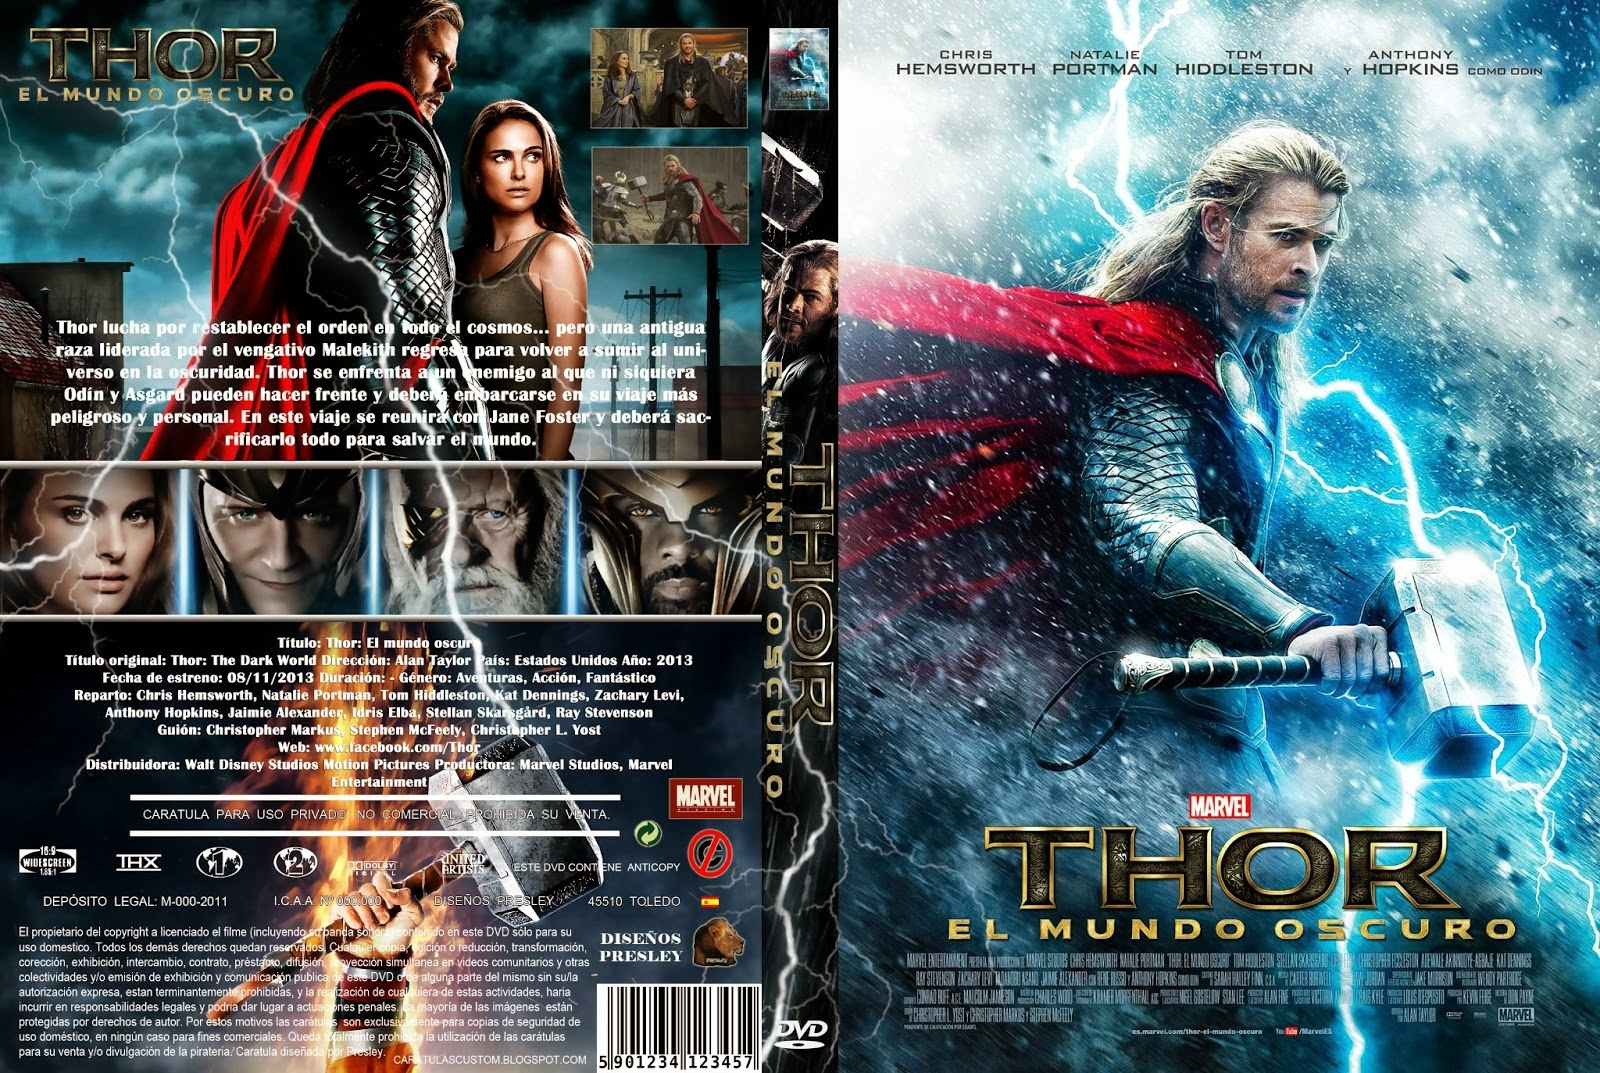 Thor El Mundo Oscuro DVD